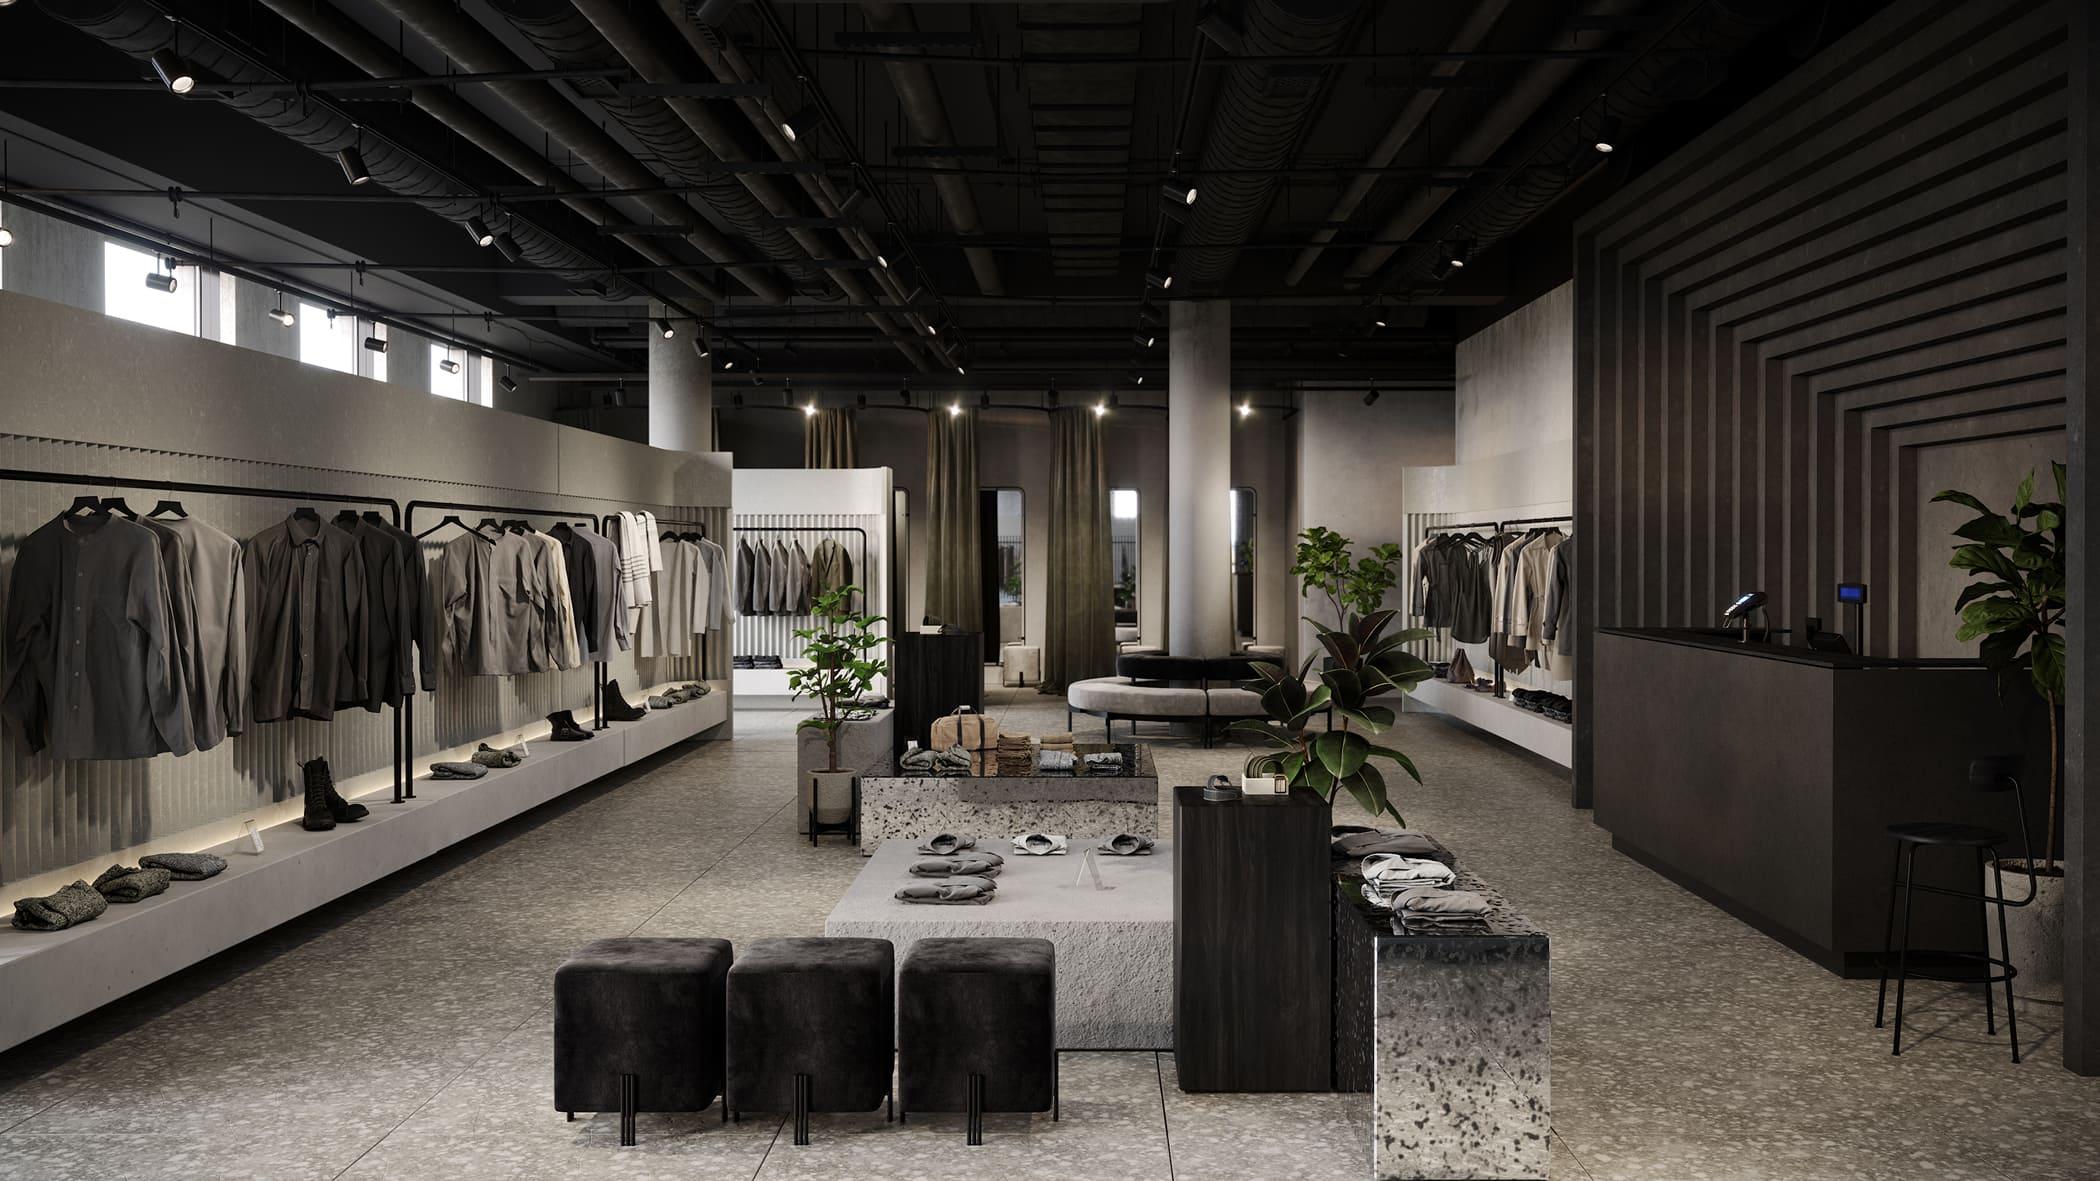 Where we shop